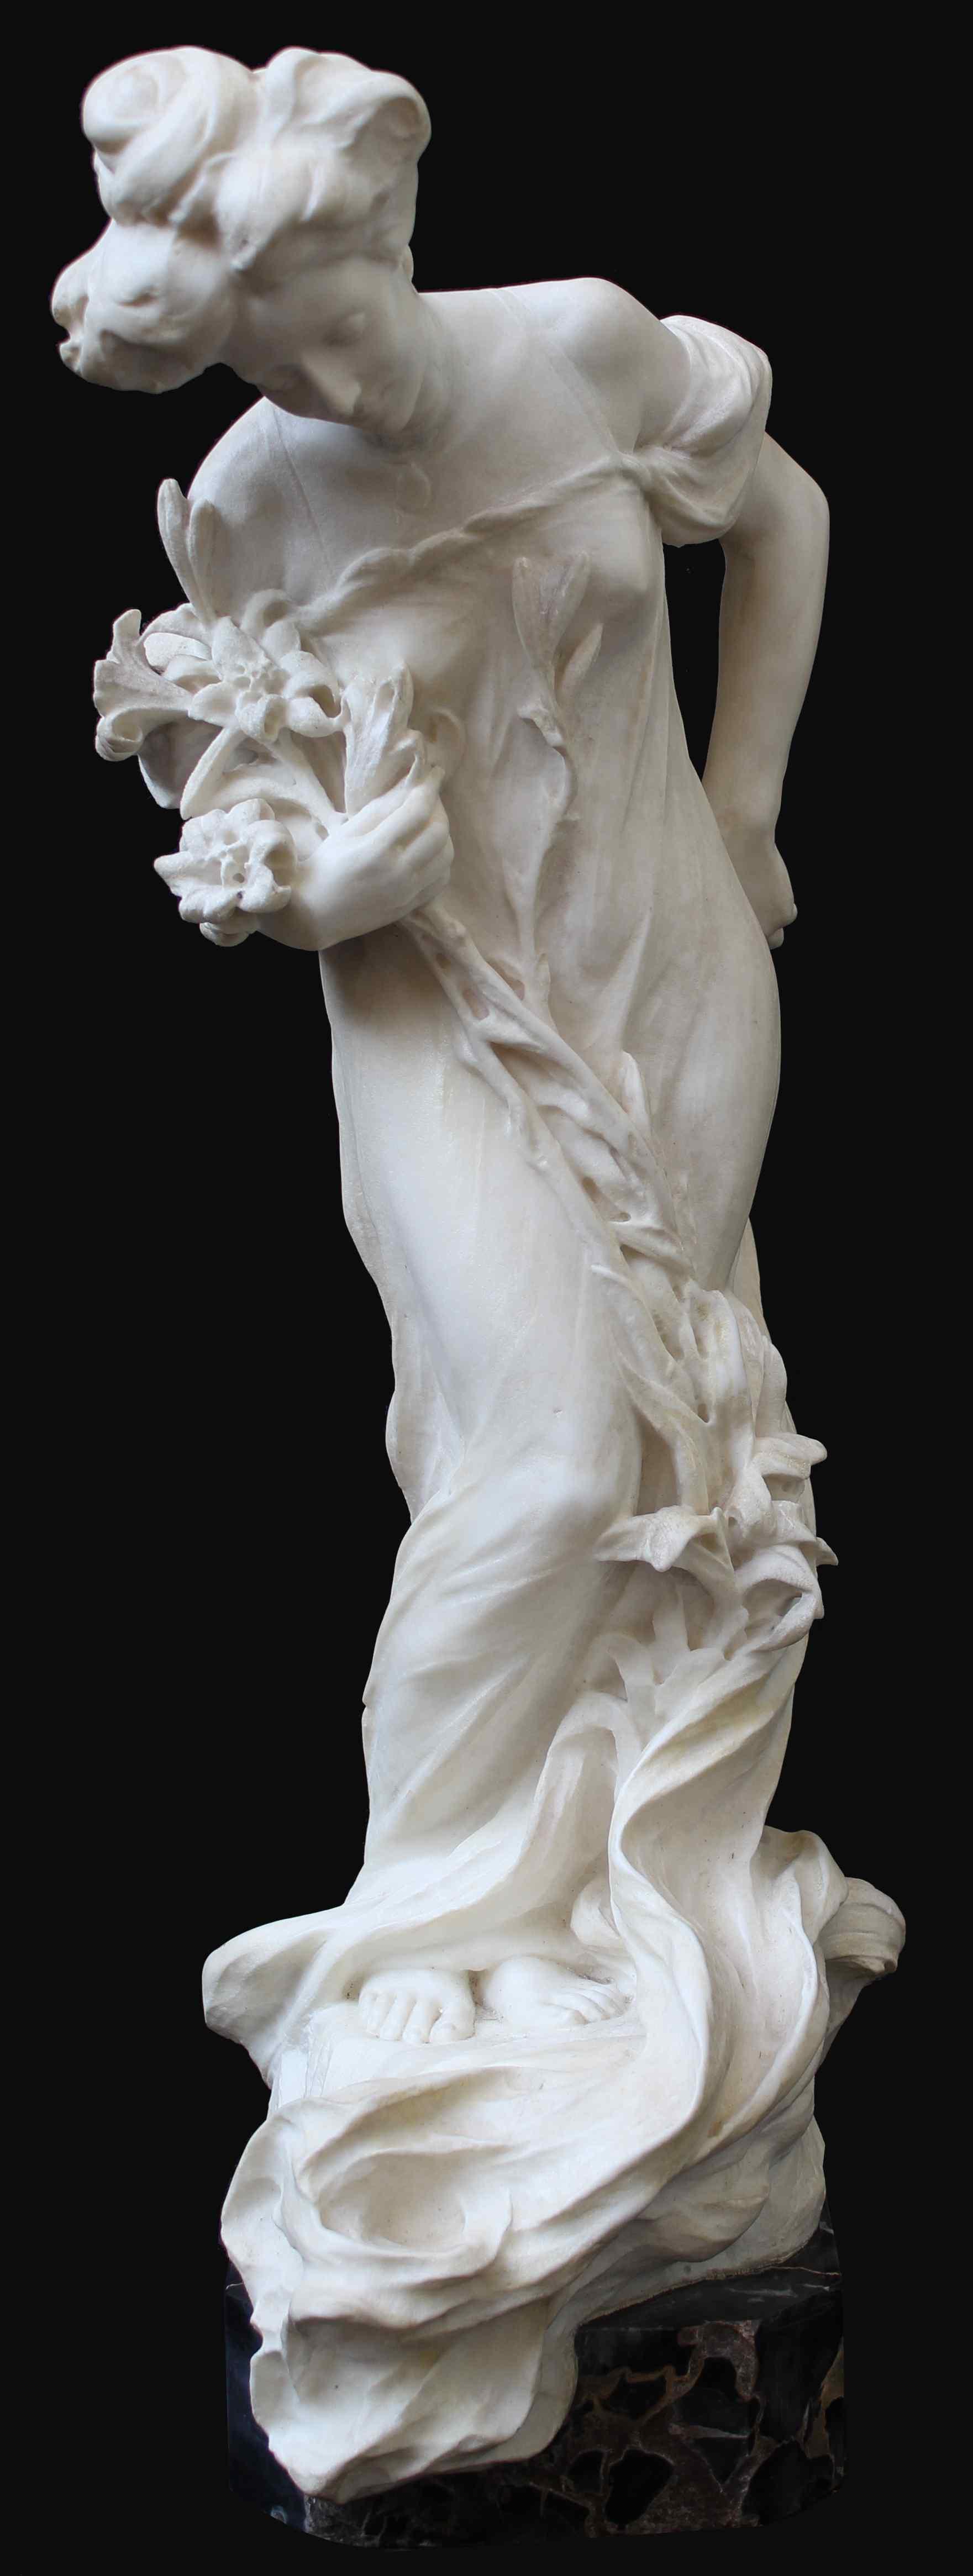 Attilio Fagioli 1877 - 1966 Figura femminile Marmo